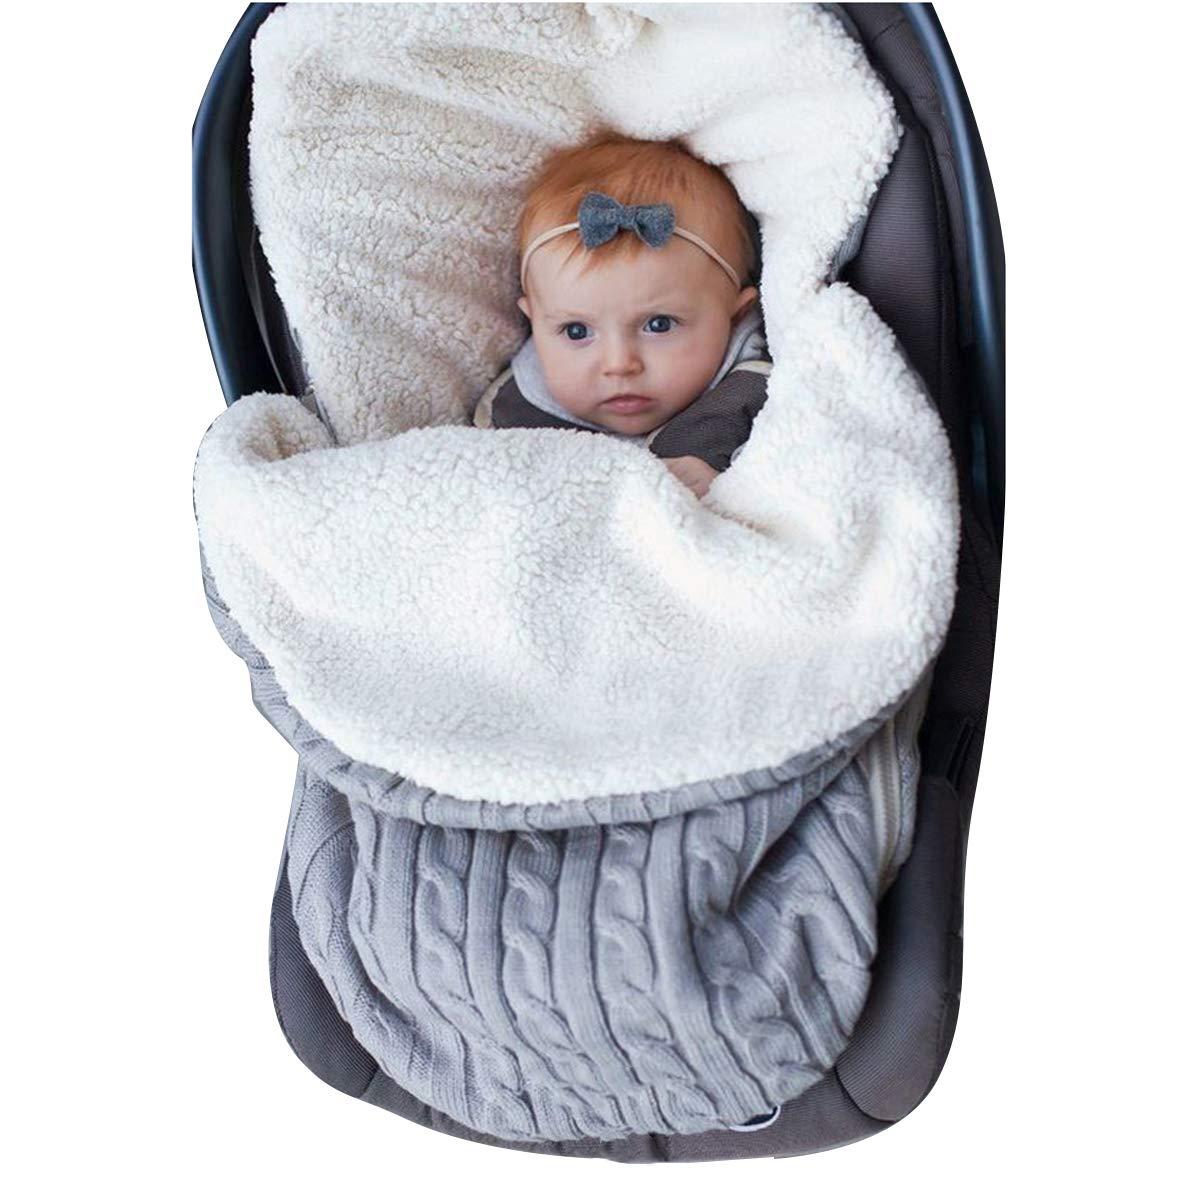 Newborn Baby Swaddle Blanket Wrap, Thick Baby Kids Toddler Knit Soft Warm Fleece Blanket Swaddle Sleeping Bag Sack Sleep Bag Stroller Unisex Wrap for 0-12 Month Baby Boys Girls (Grey) by oenbopo